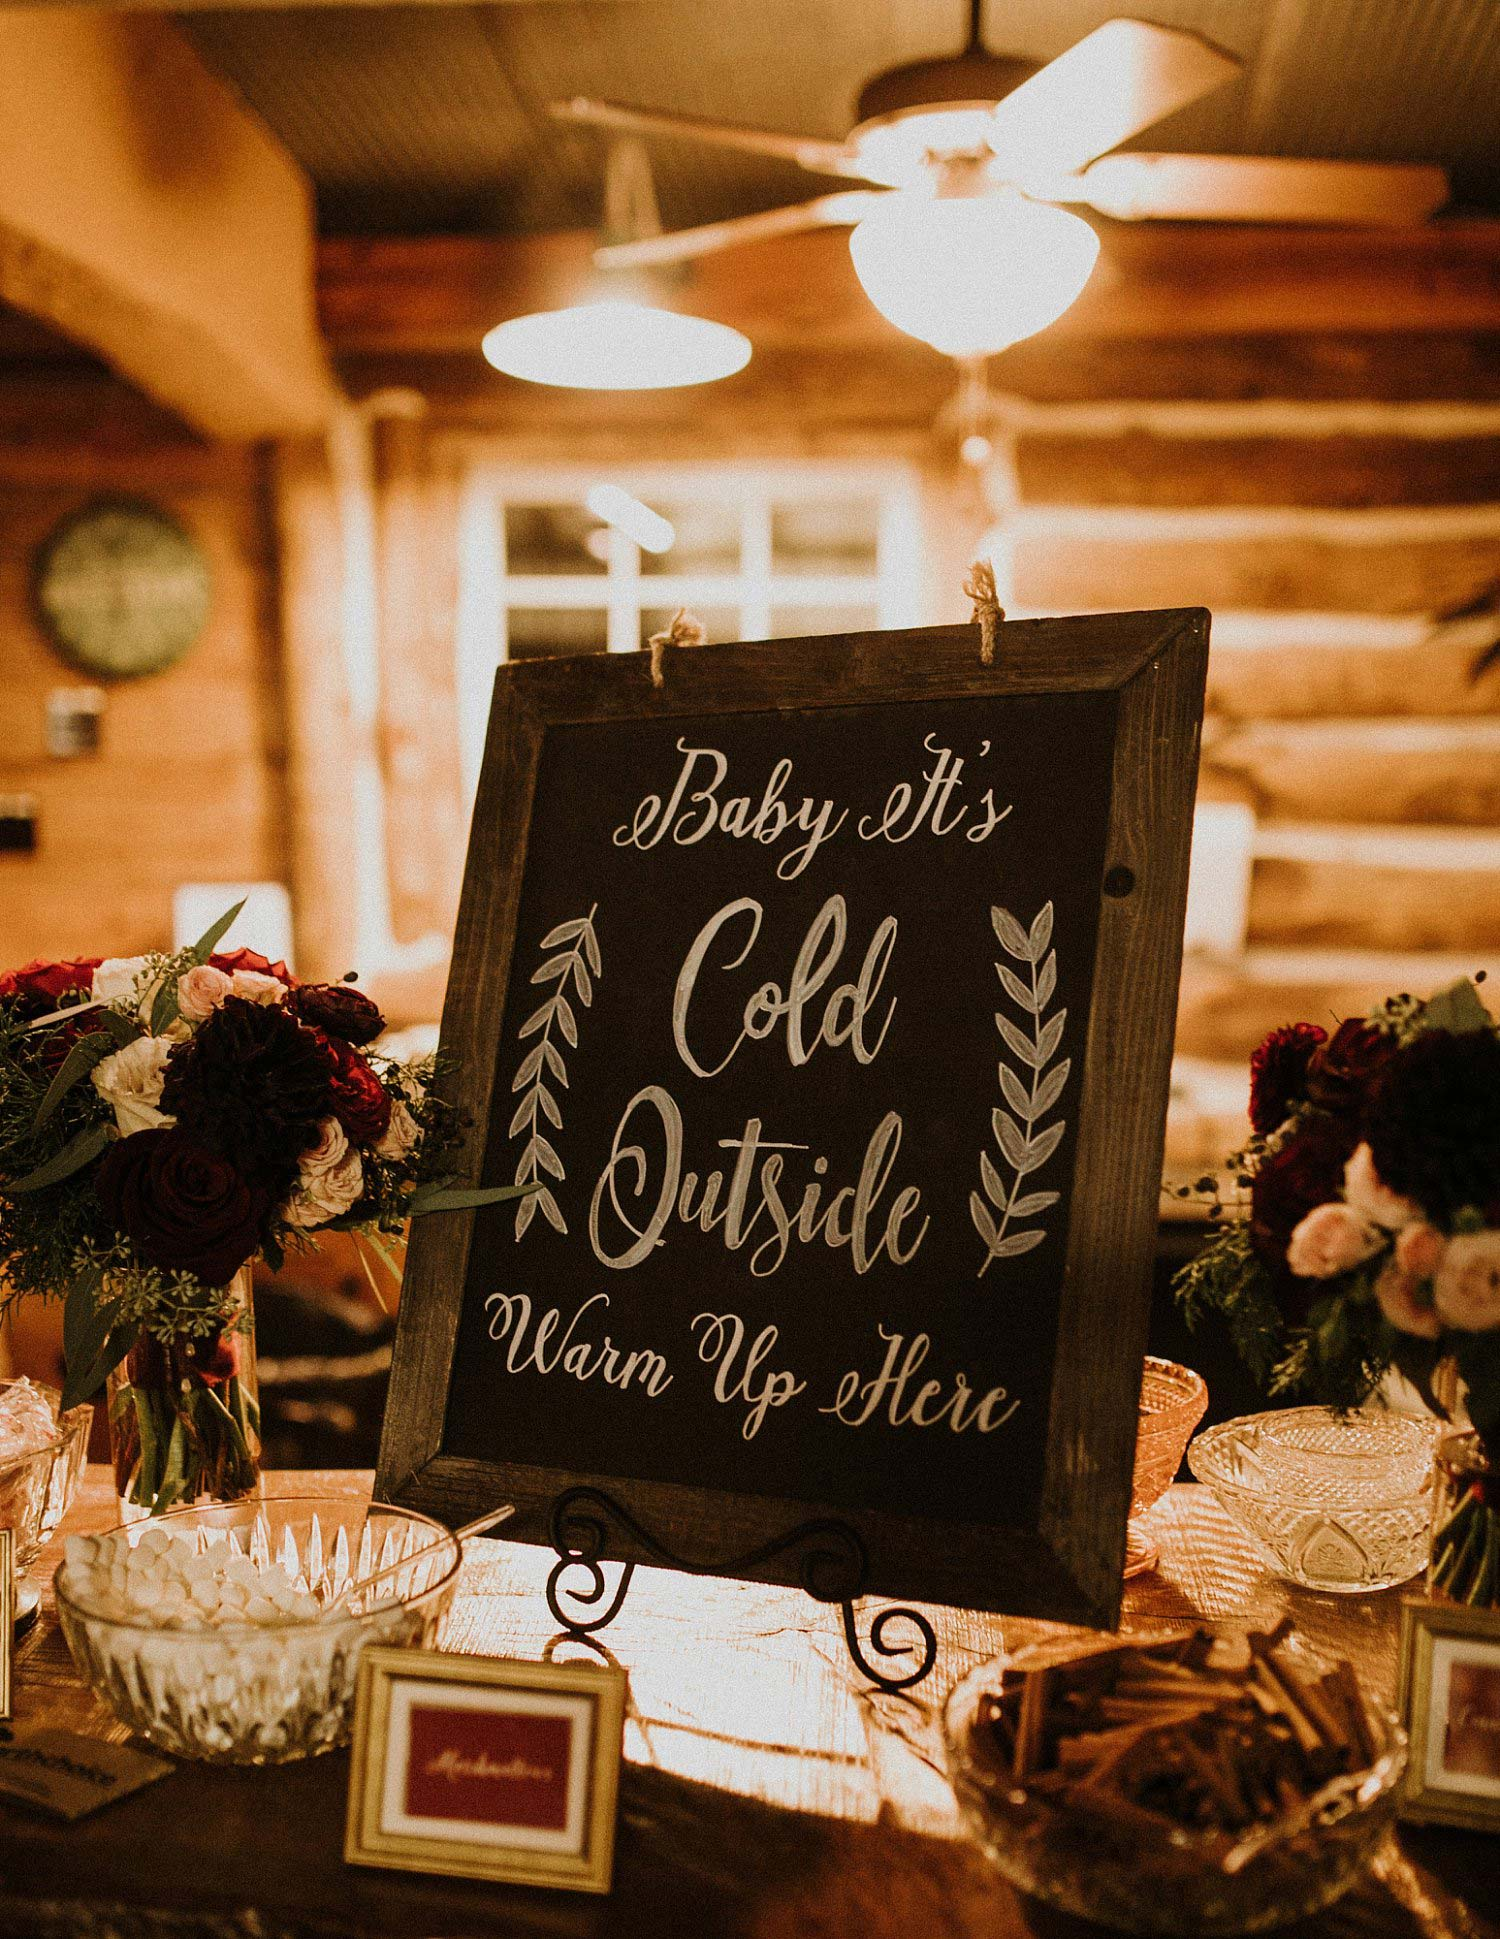 Hollow Hill Farm Event Center Wedding coffee bar chalkboard signage with wood frame